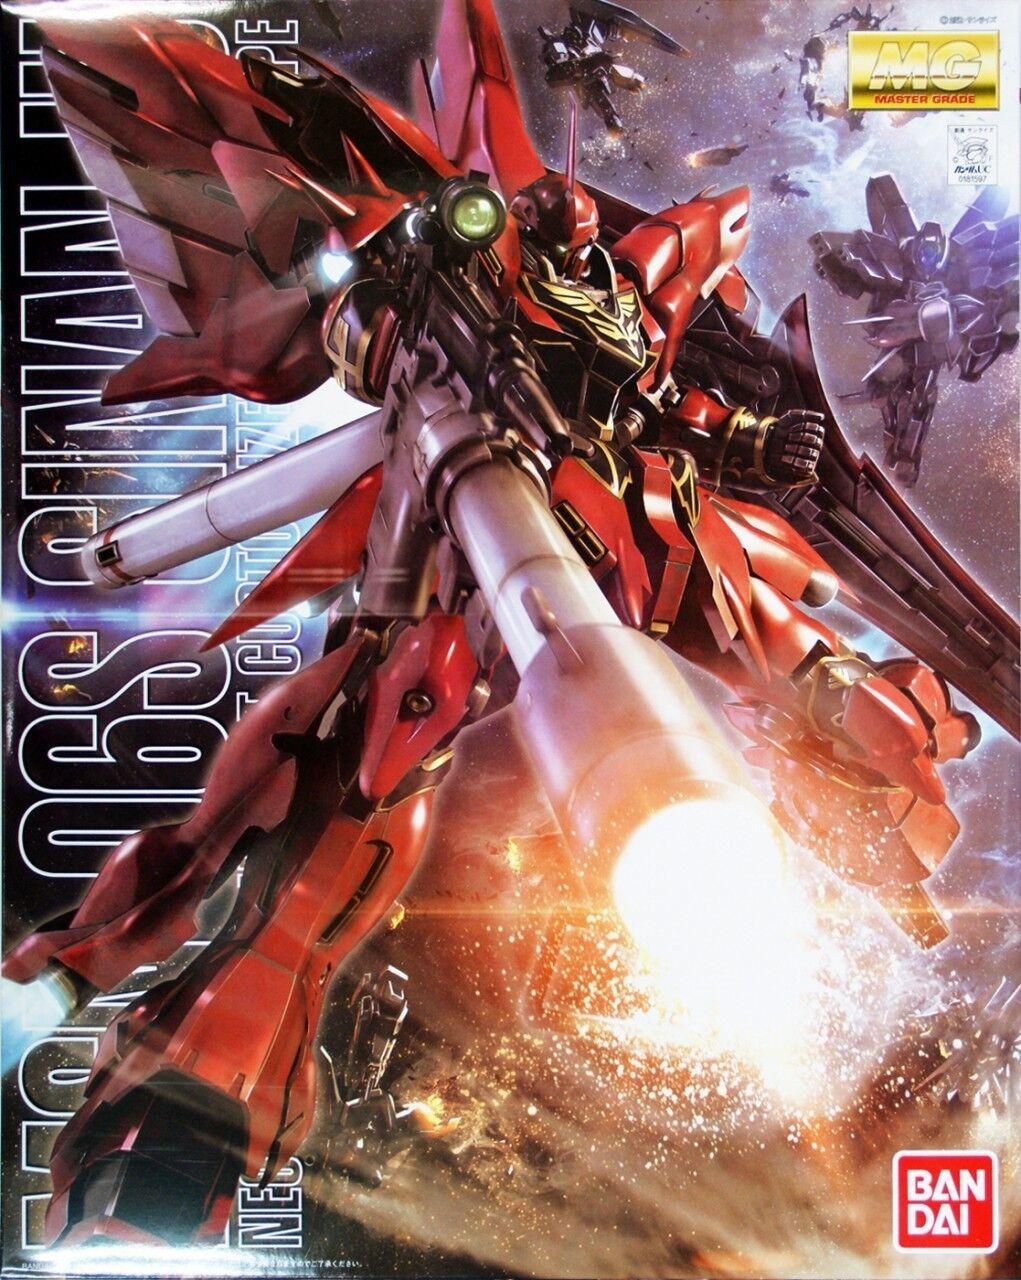 Model Kit - Bandai - MG MSN-06S Sinanju - Anime Colore 1 100 - Nuovo